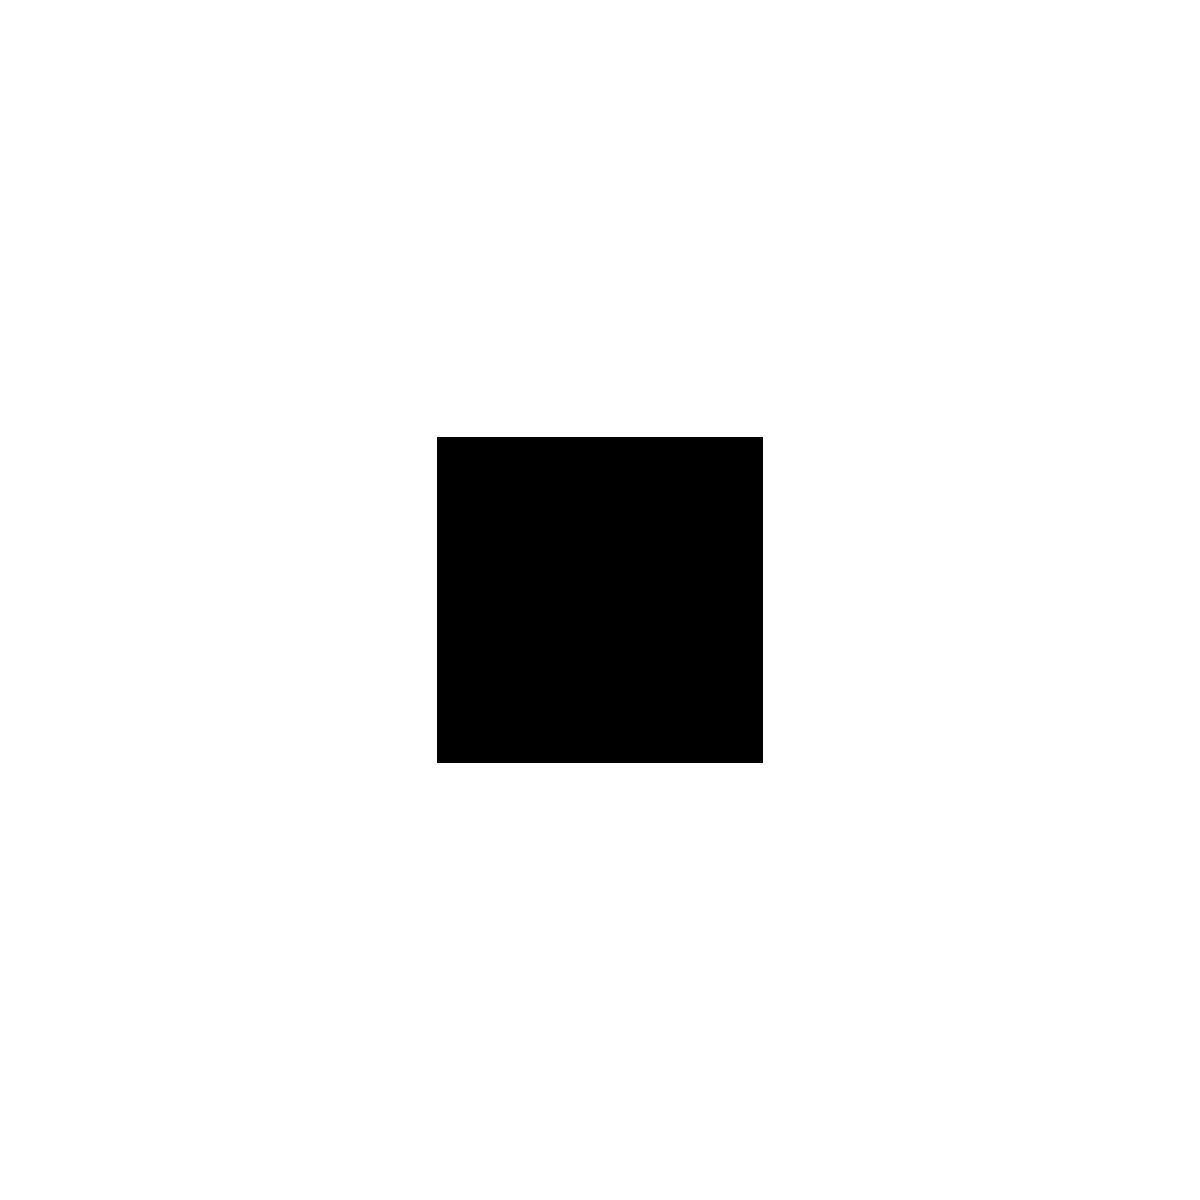 Deck_Patterns_88.png